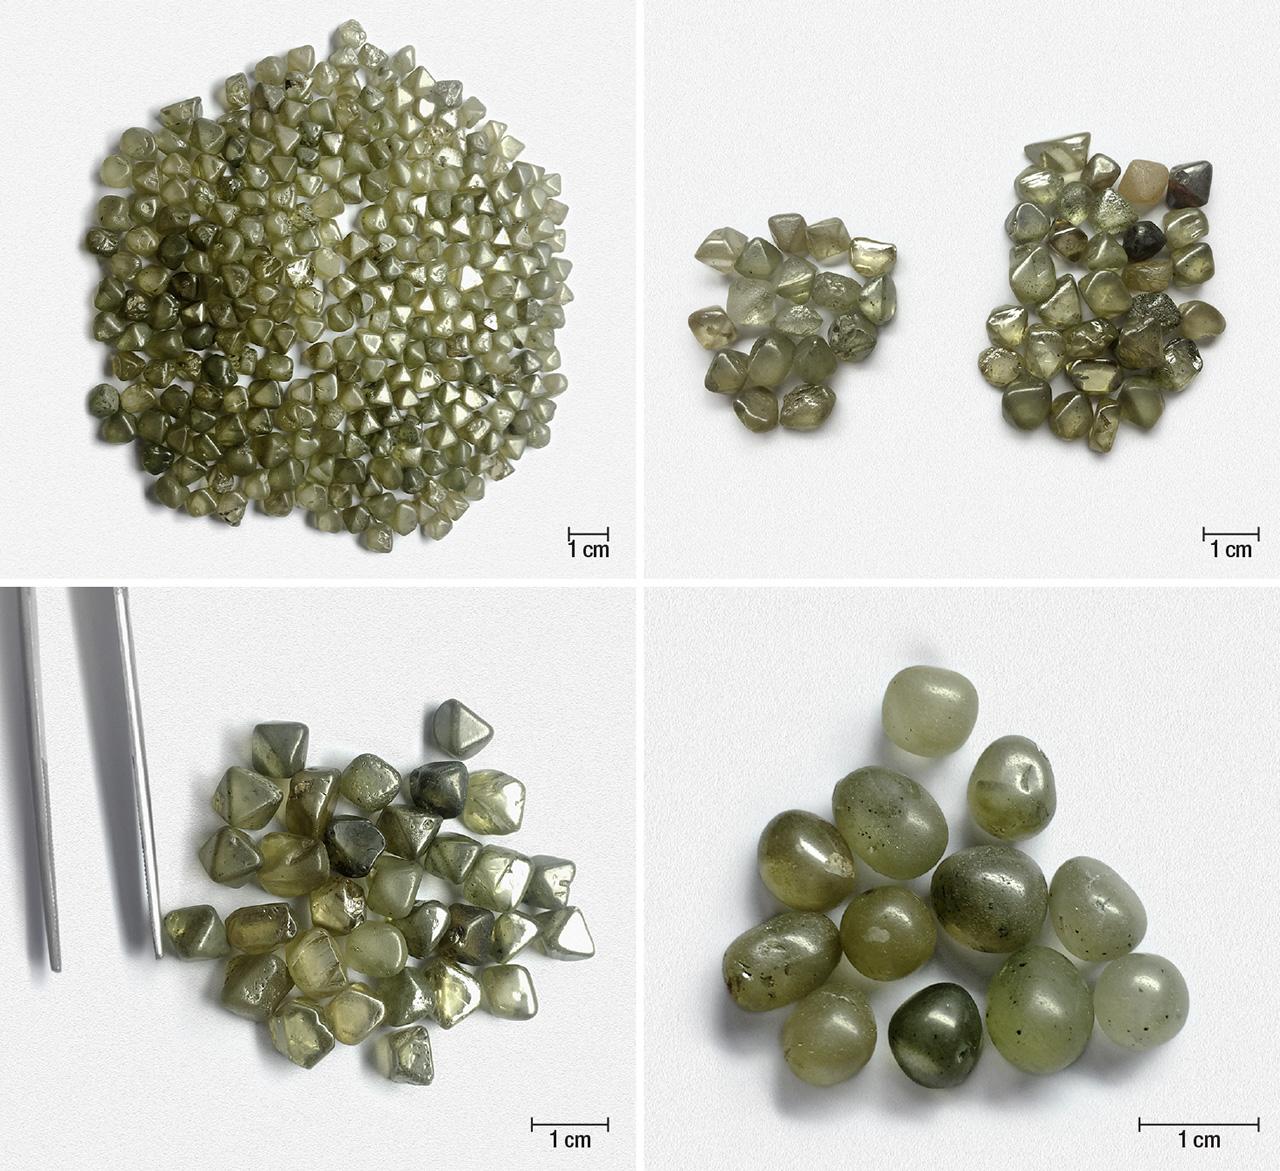 Rough diamonds from the Marange deposit in eastern Zimbabwe